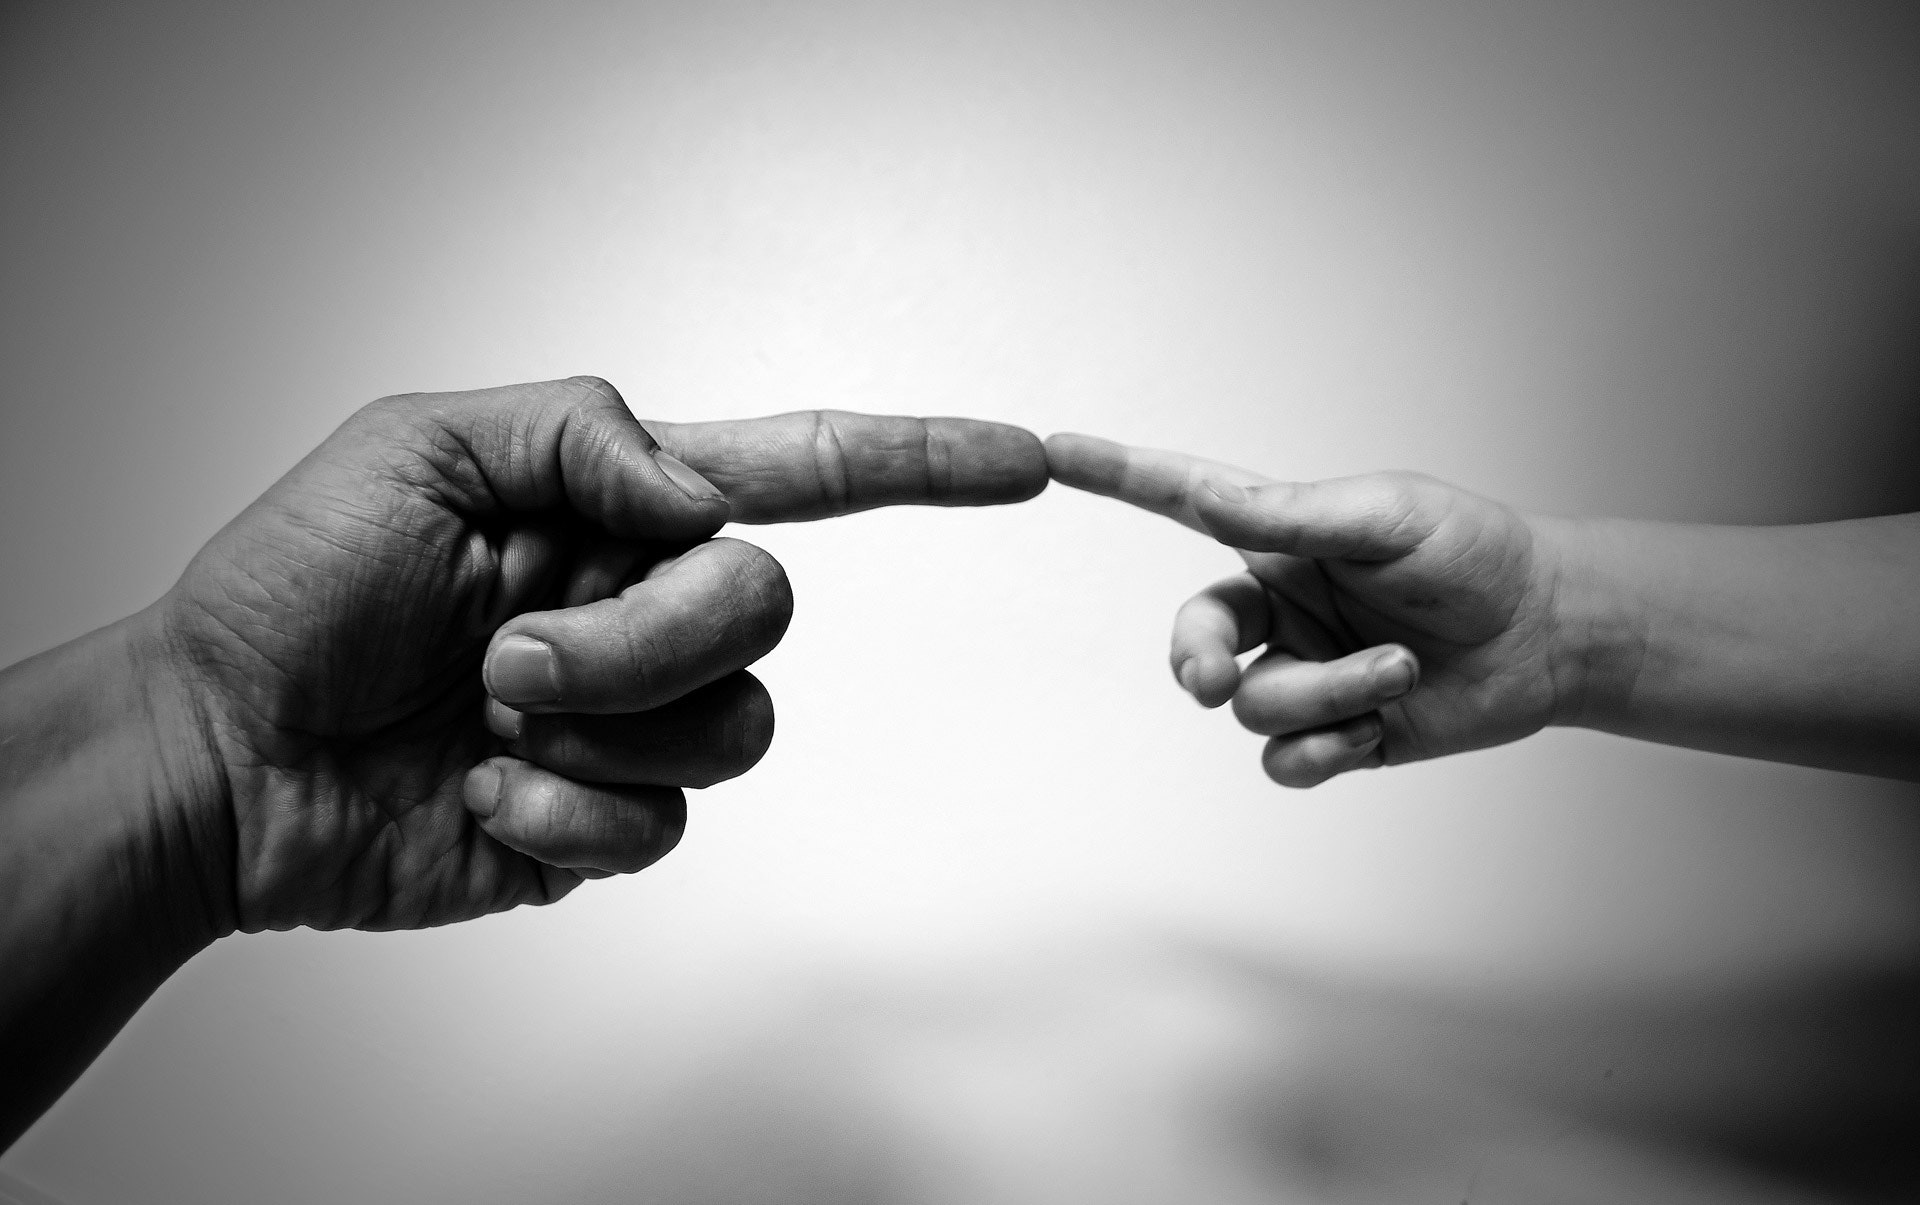 black-and-white-fingers-hands-73805.jpg